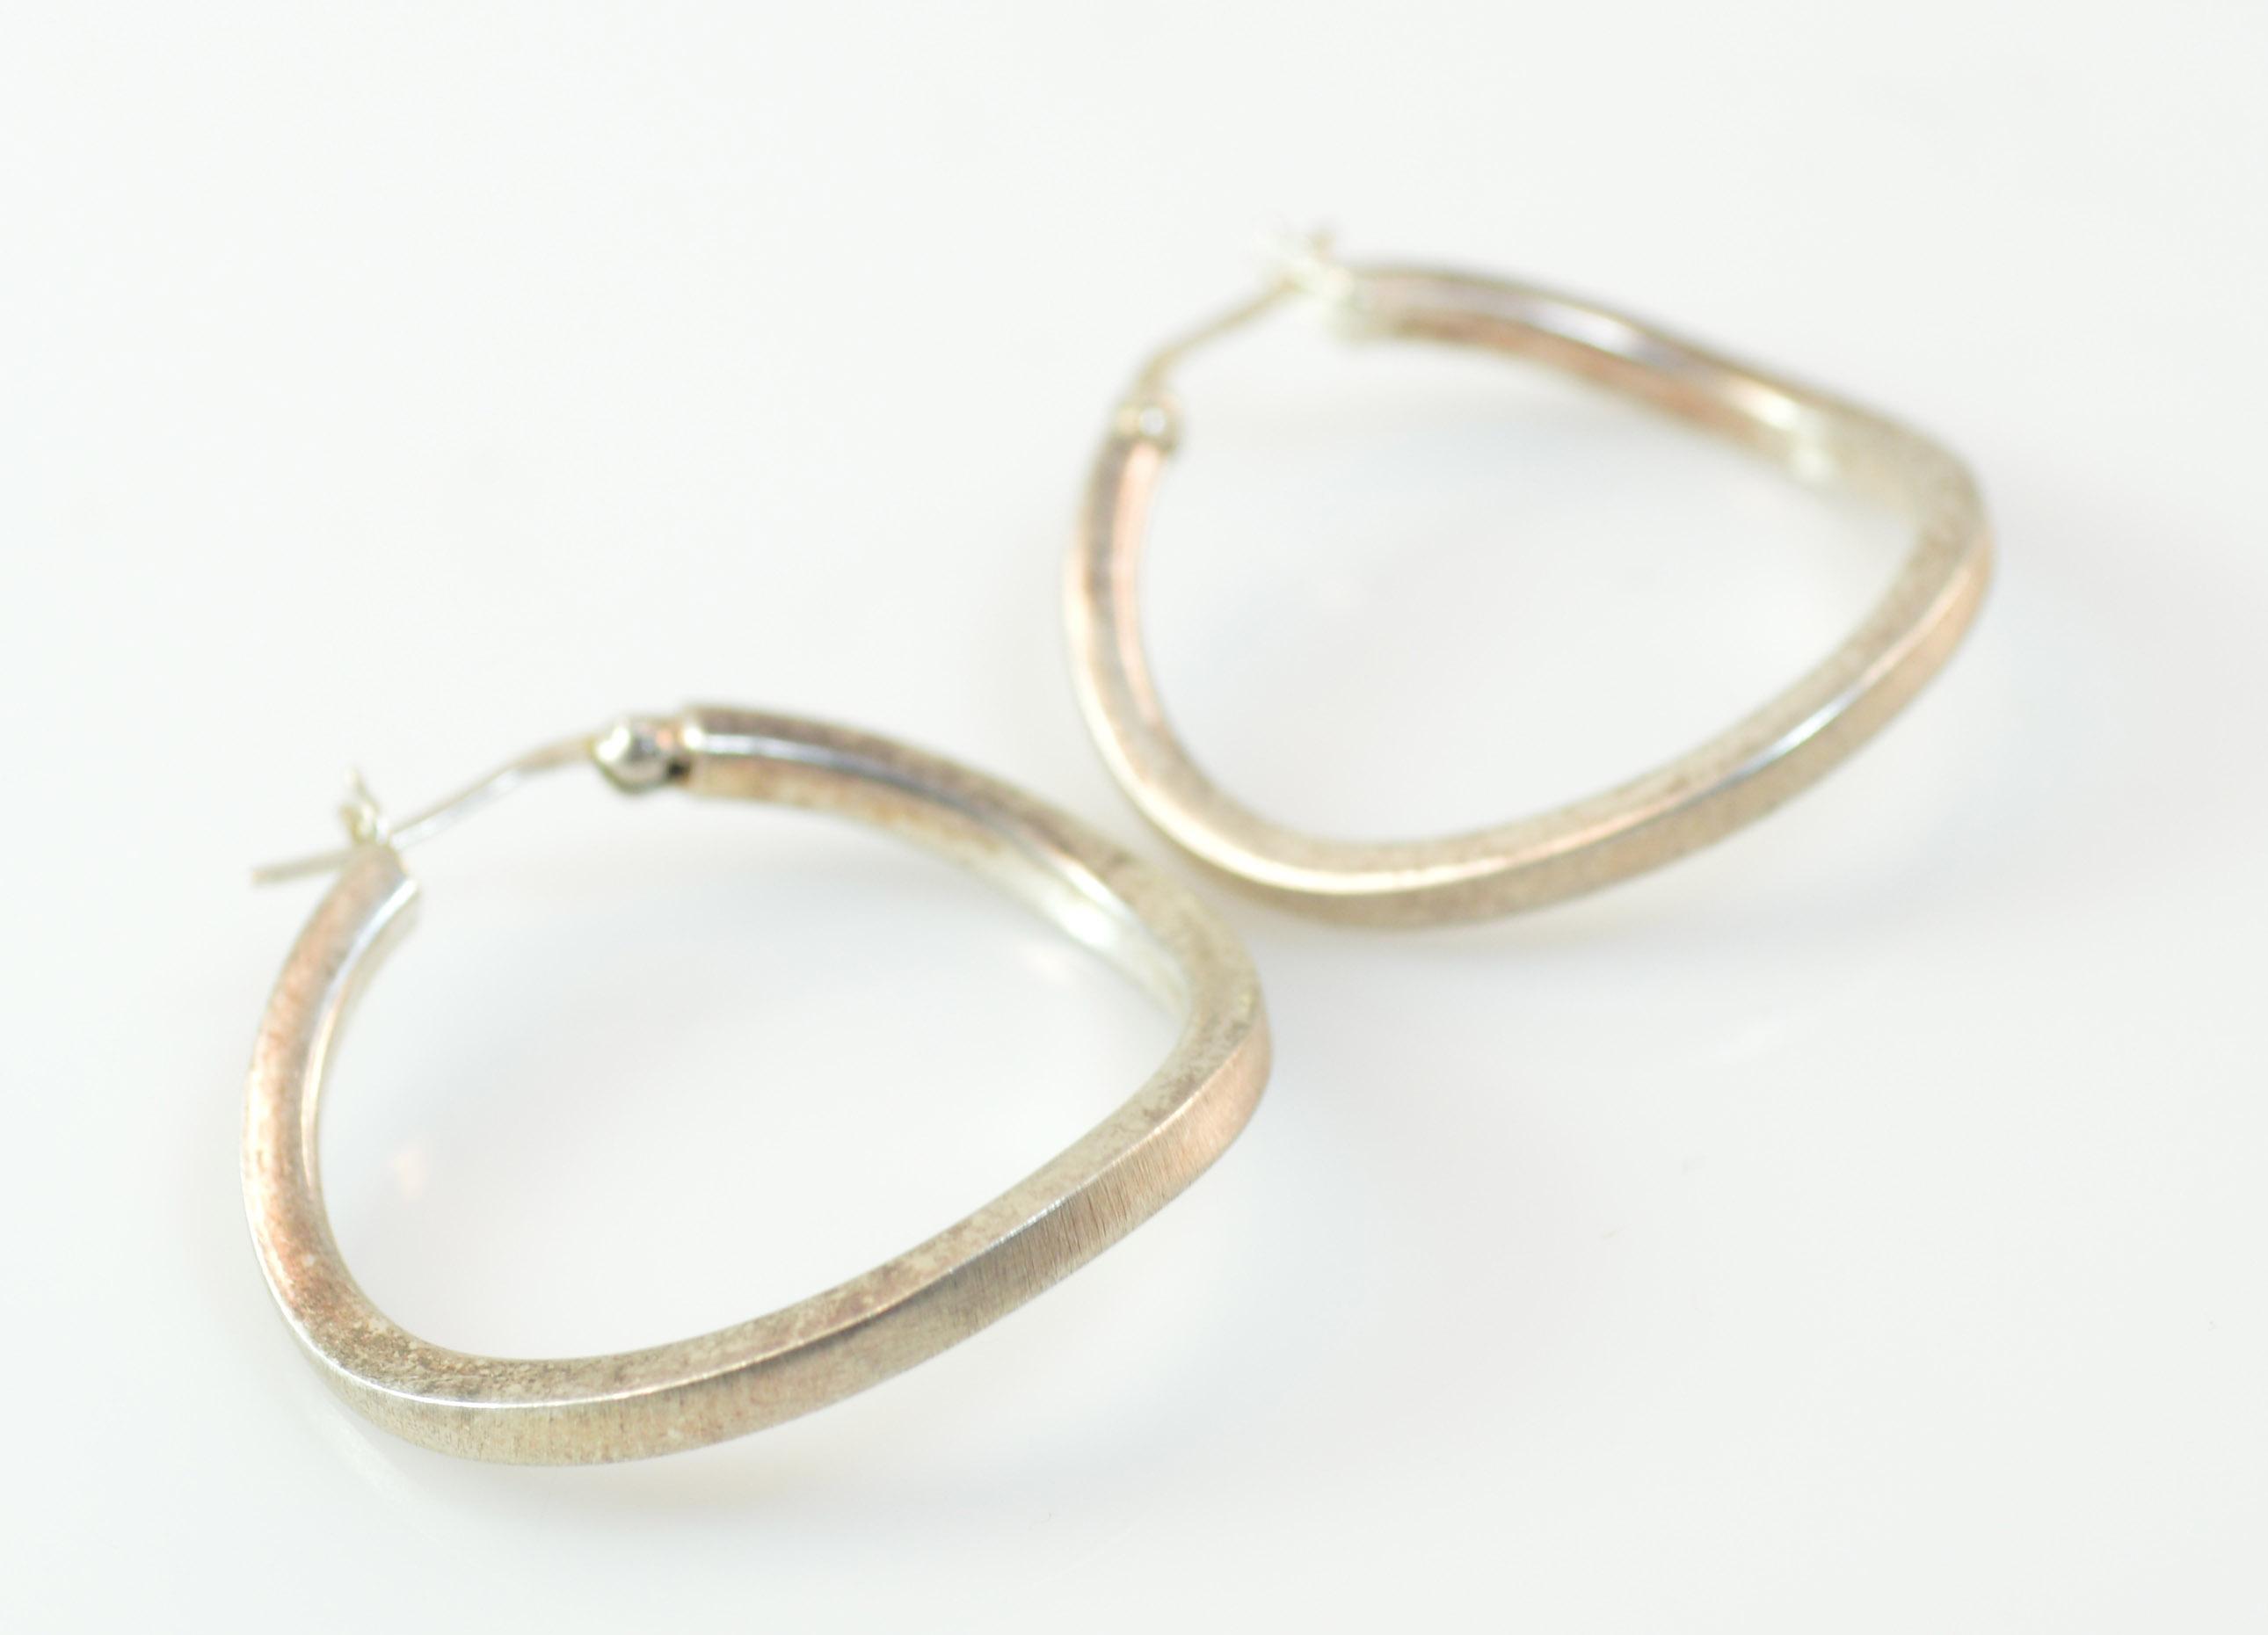 6g Solid Silver Curved Hinged Back Hoop Sterling Earrings Marked 925